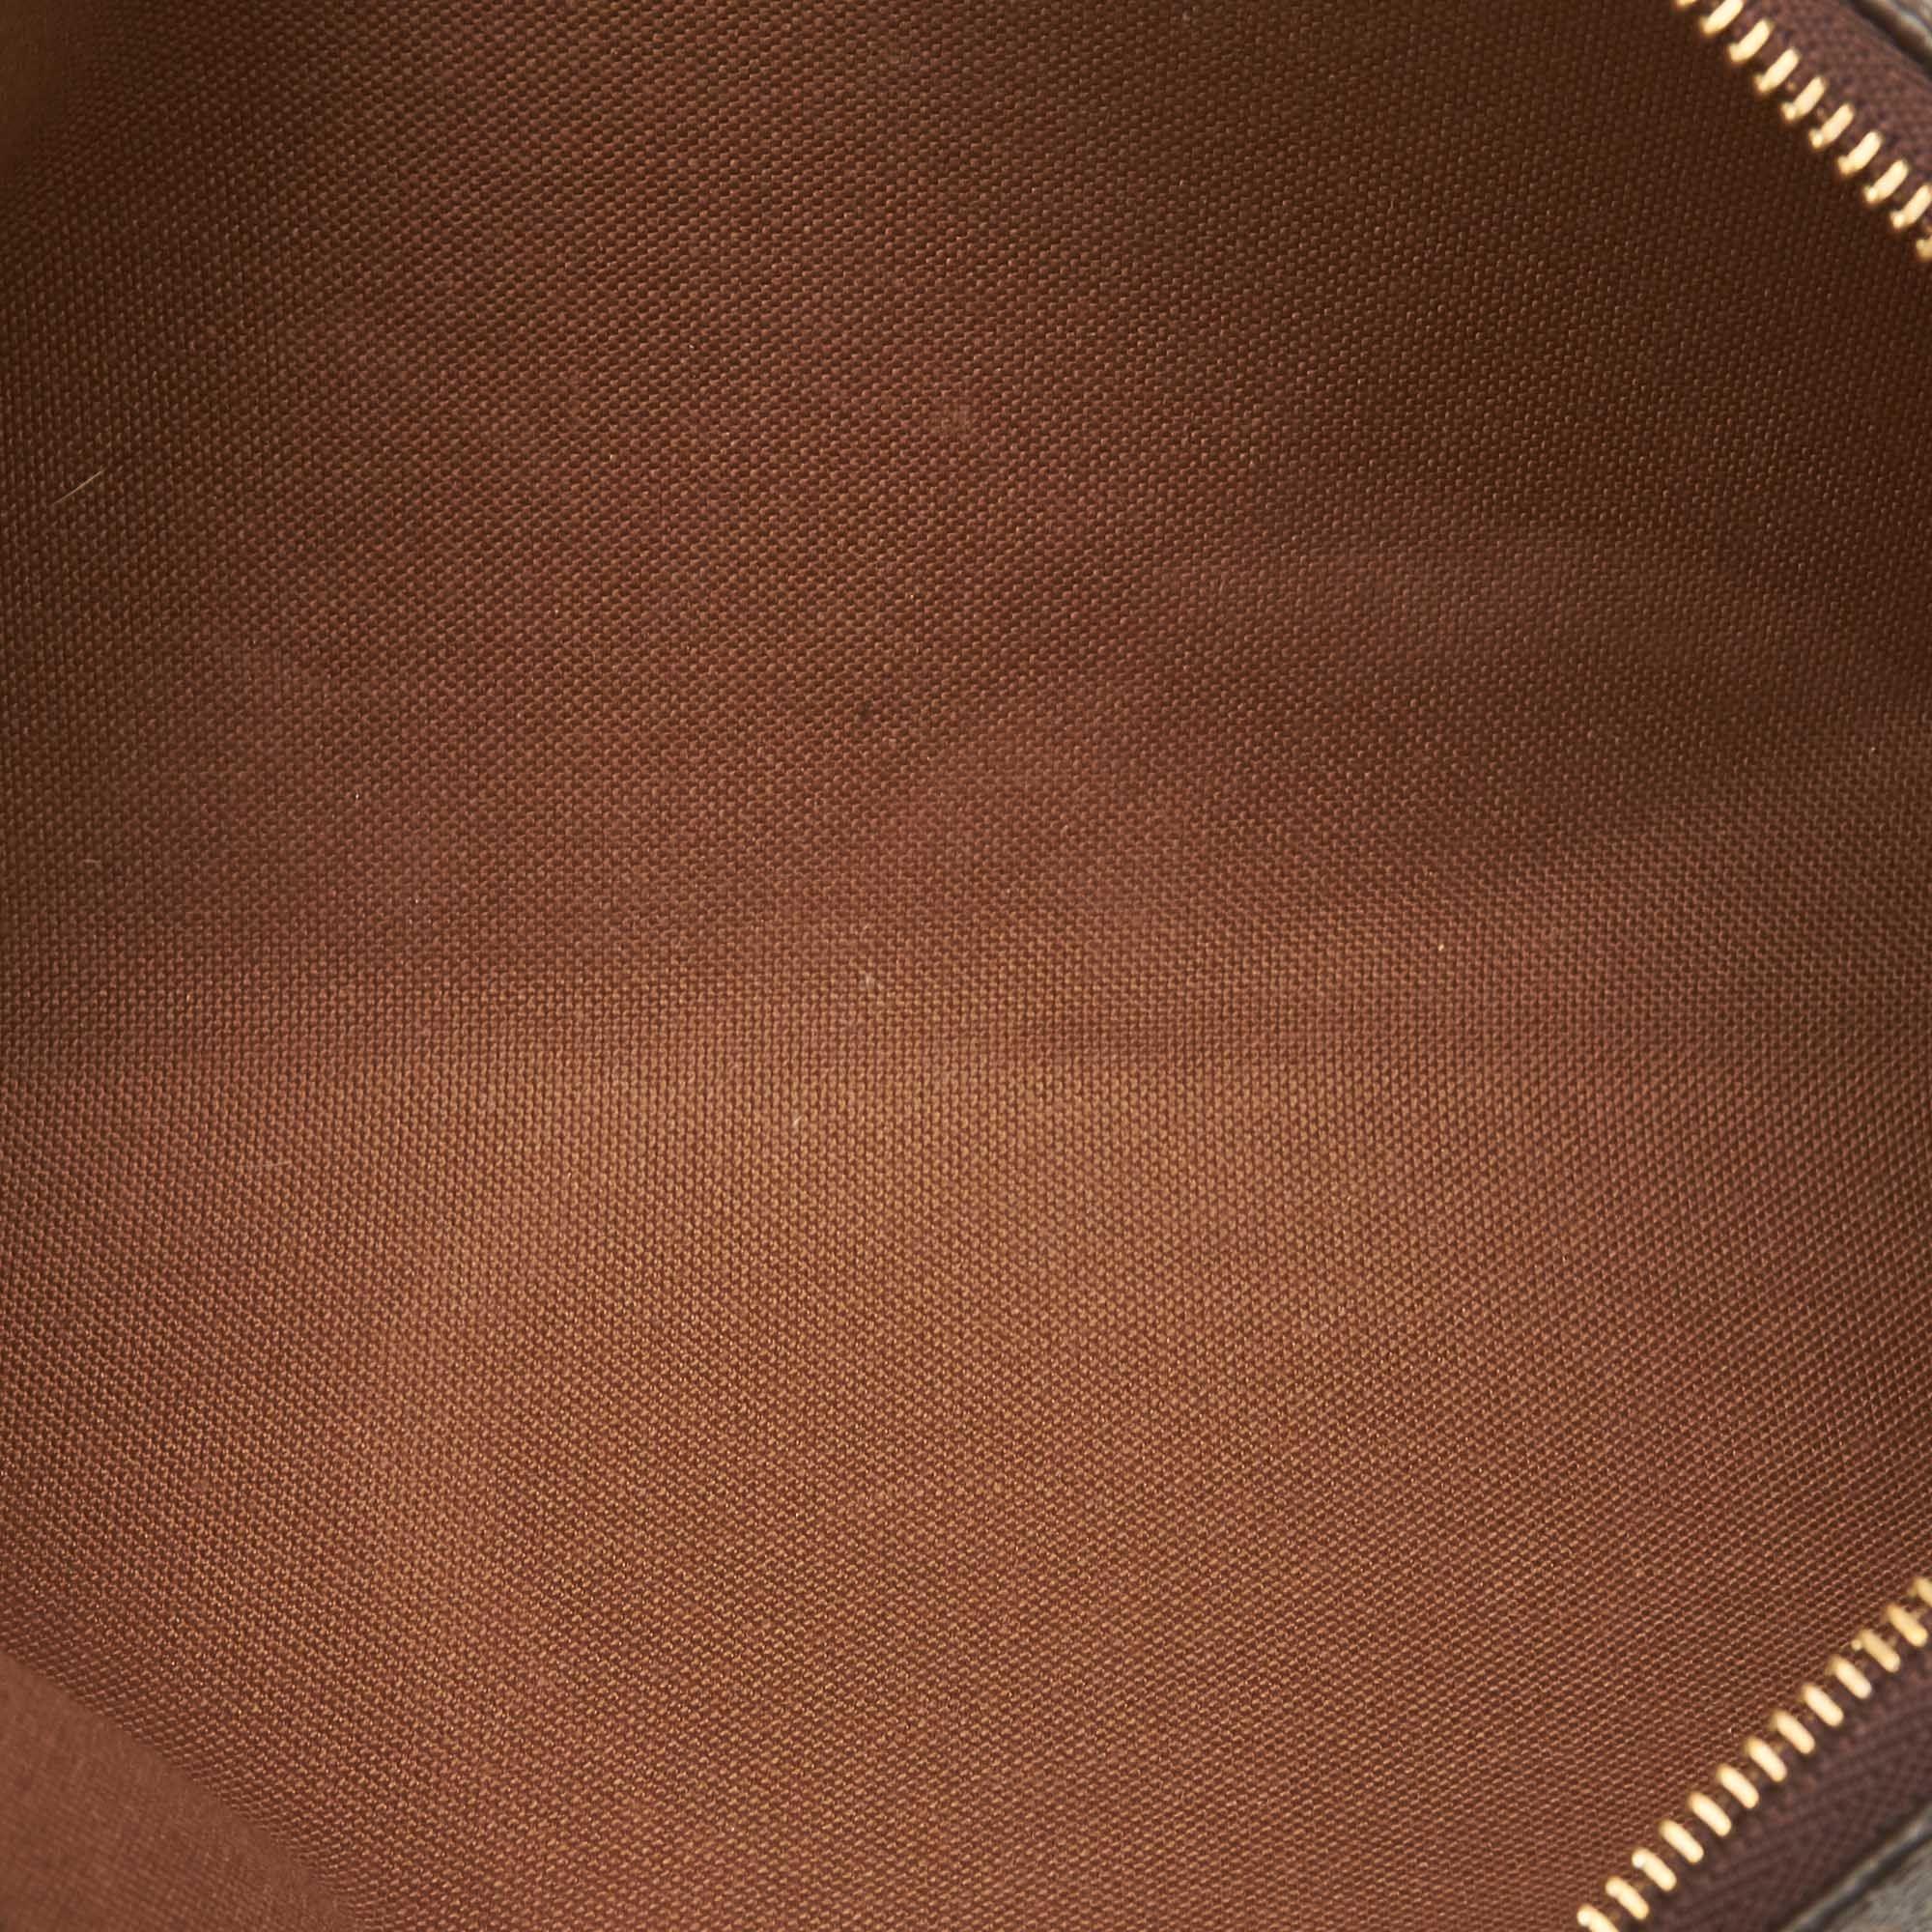 Vintage Louis Vuitton Monogram Eva Brown